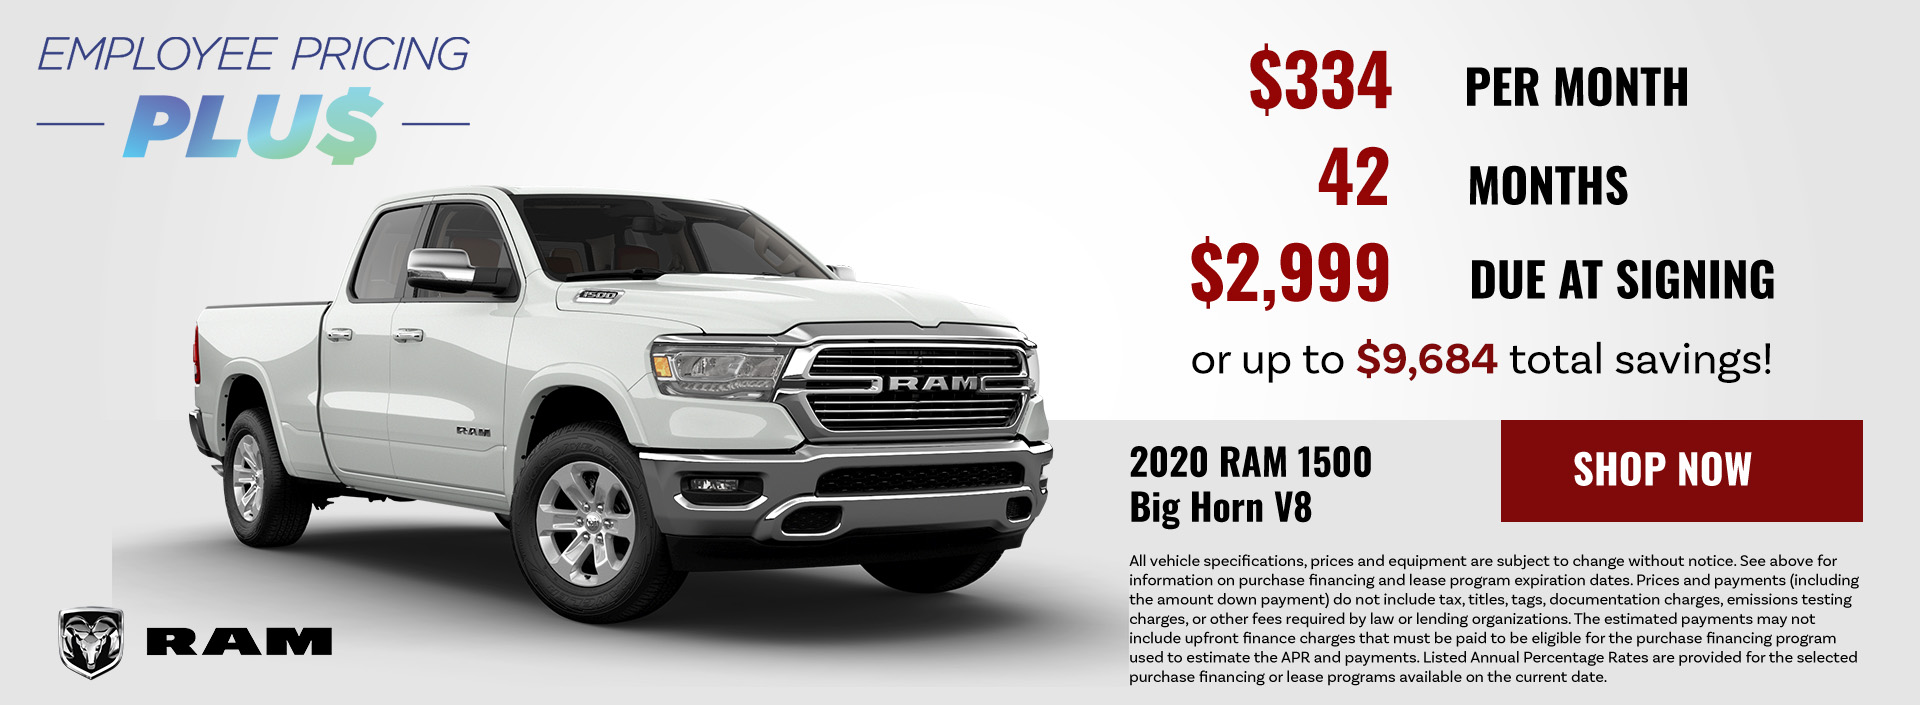 2020 RAM 1500 Big Horn V8